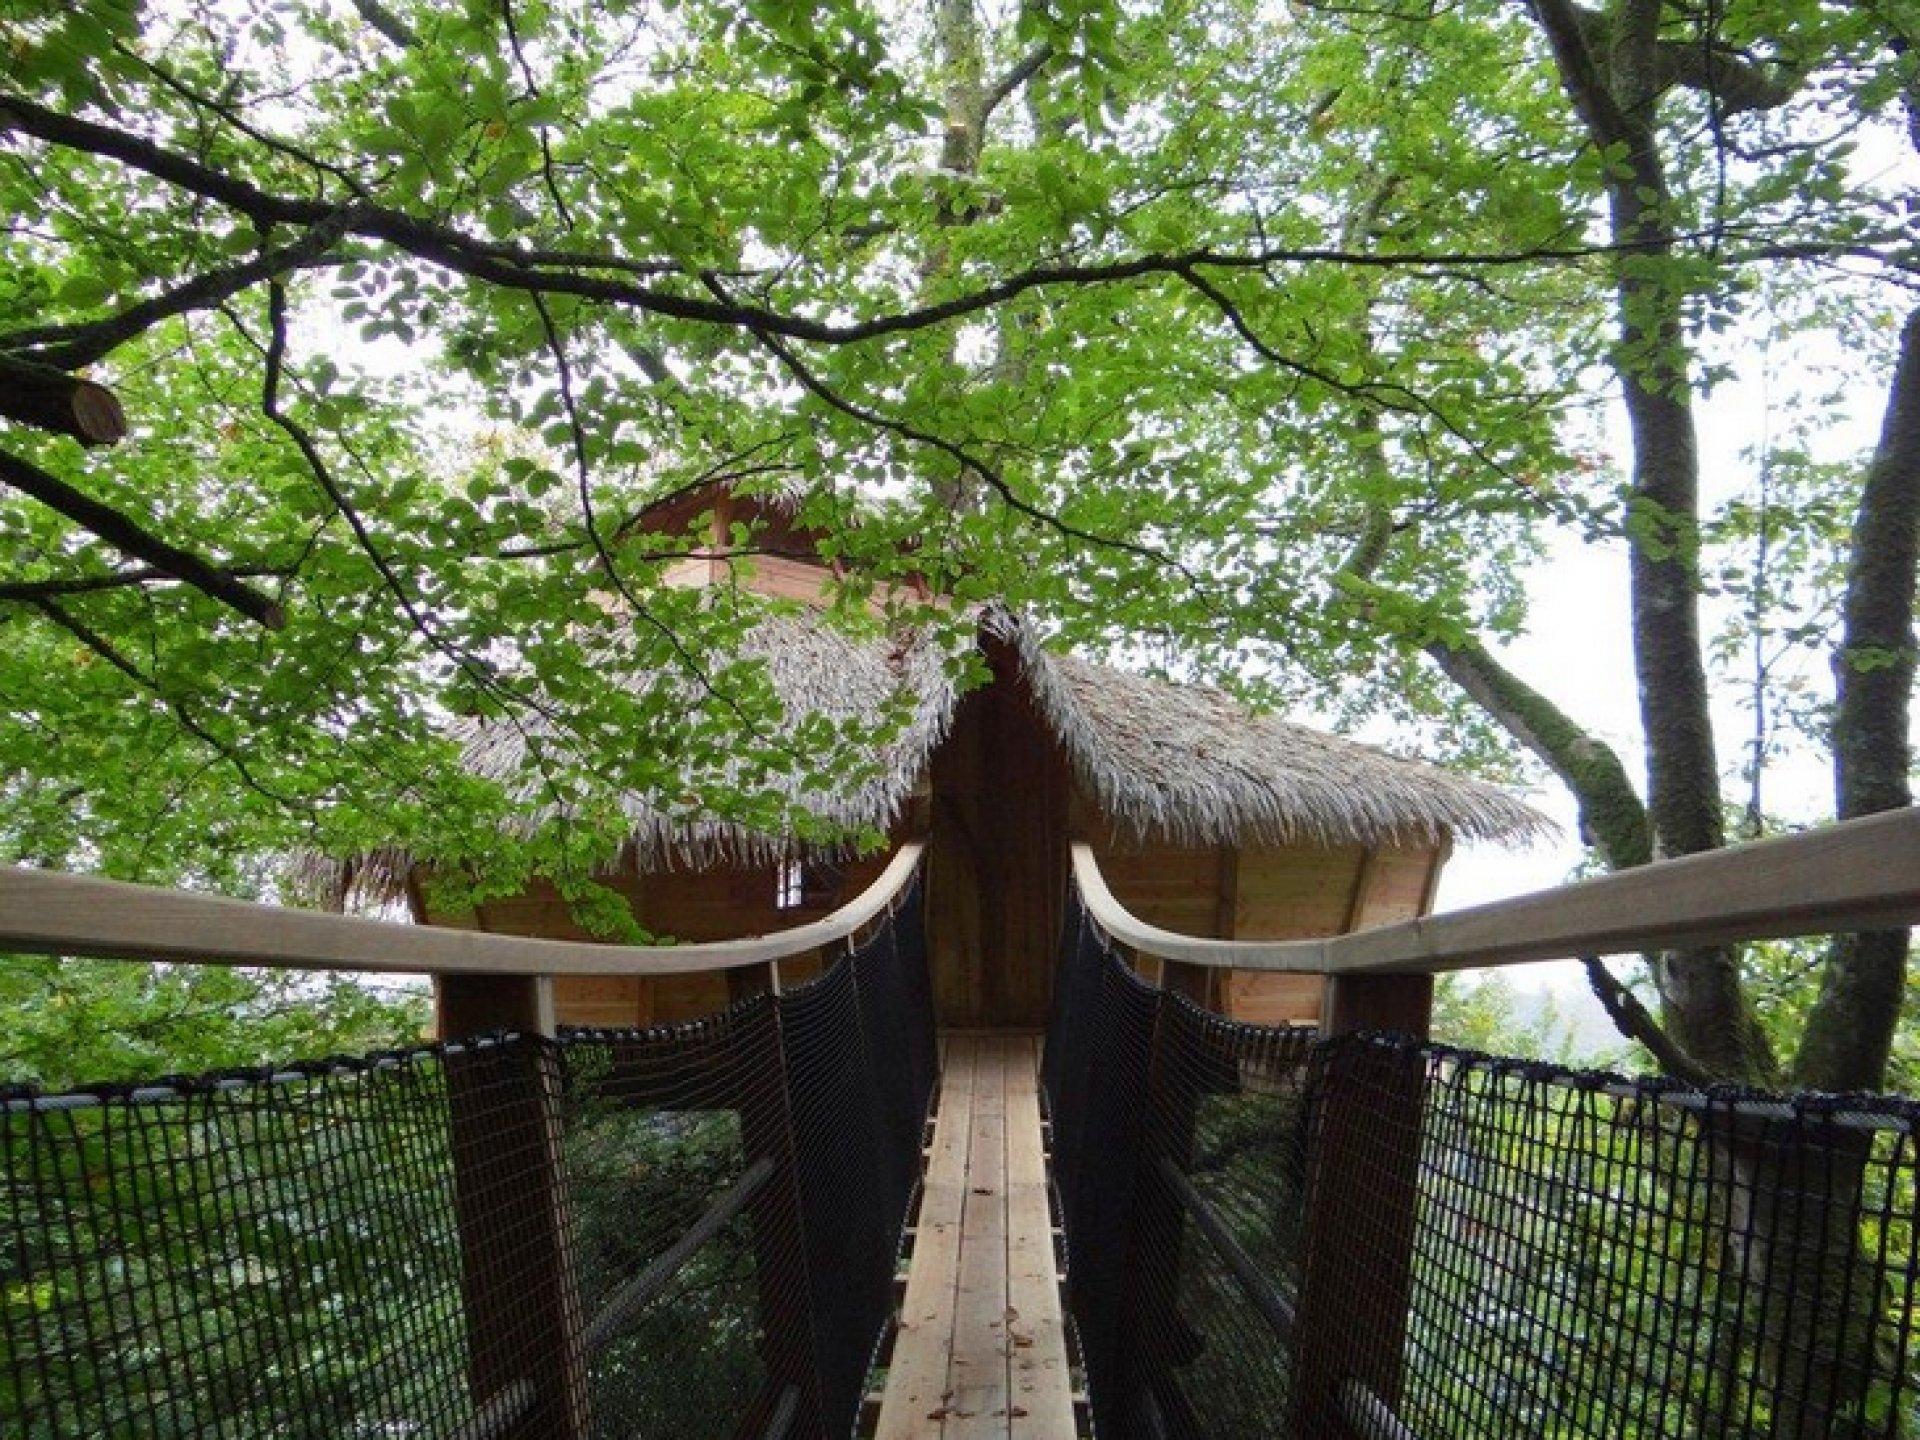 charbonni re cabane dans les arbres bretagne hebergement insolite dormir bulle. Black Bedroom Furniture Sets. Home Design Ideas